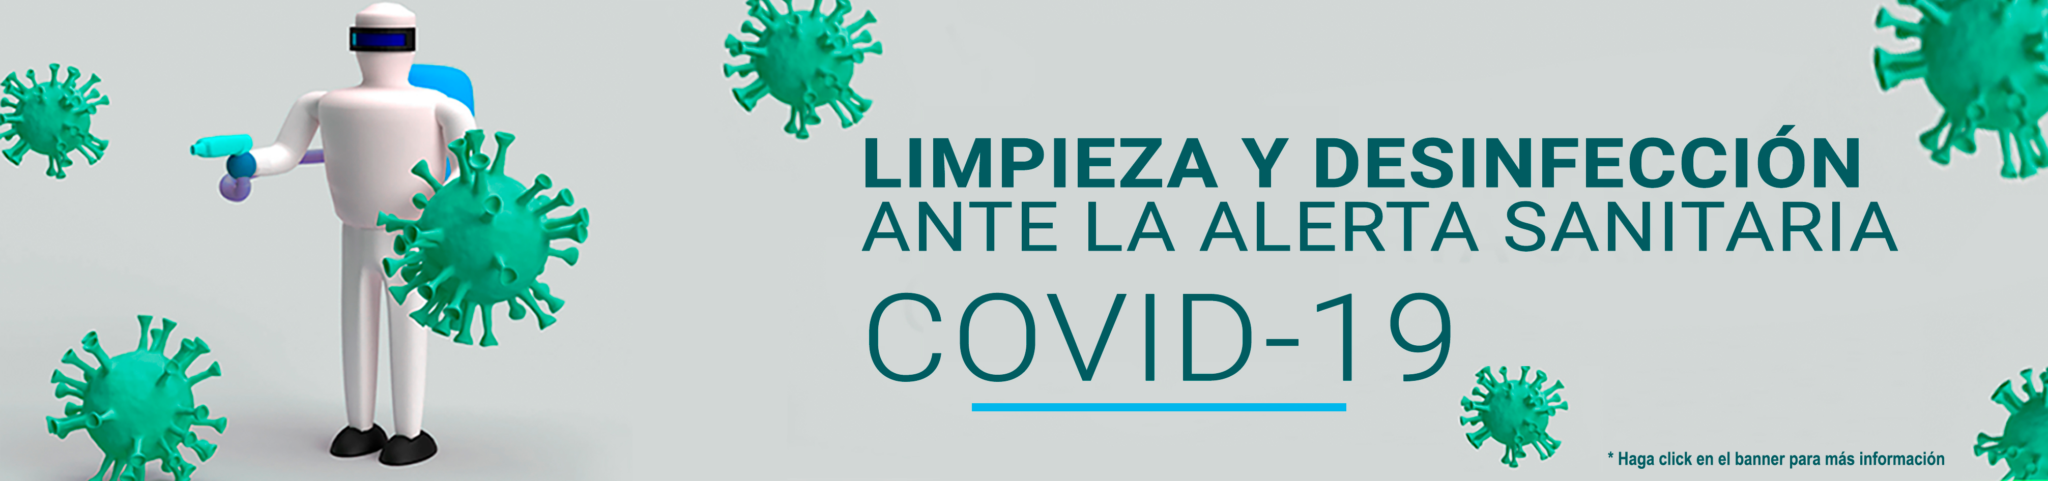 Cleanzcom - Empresa de desinfección profesional en viviendas